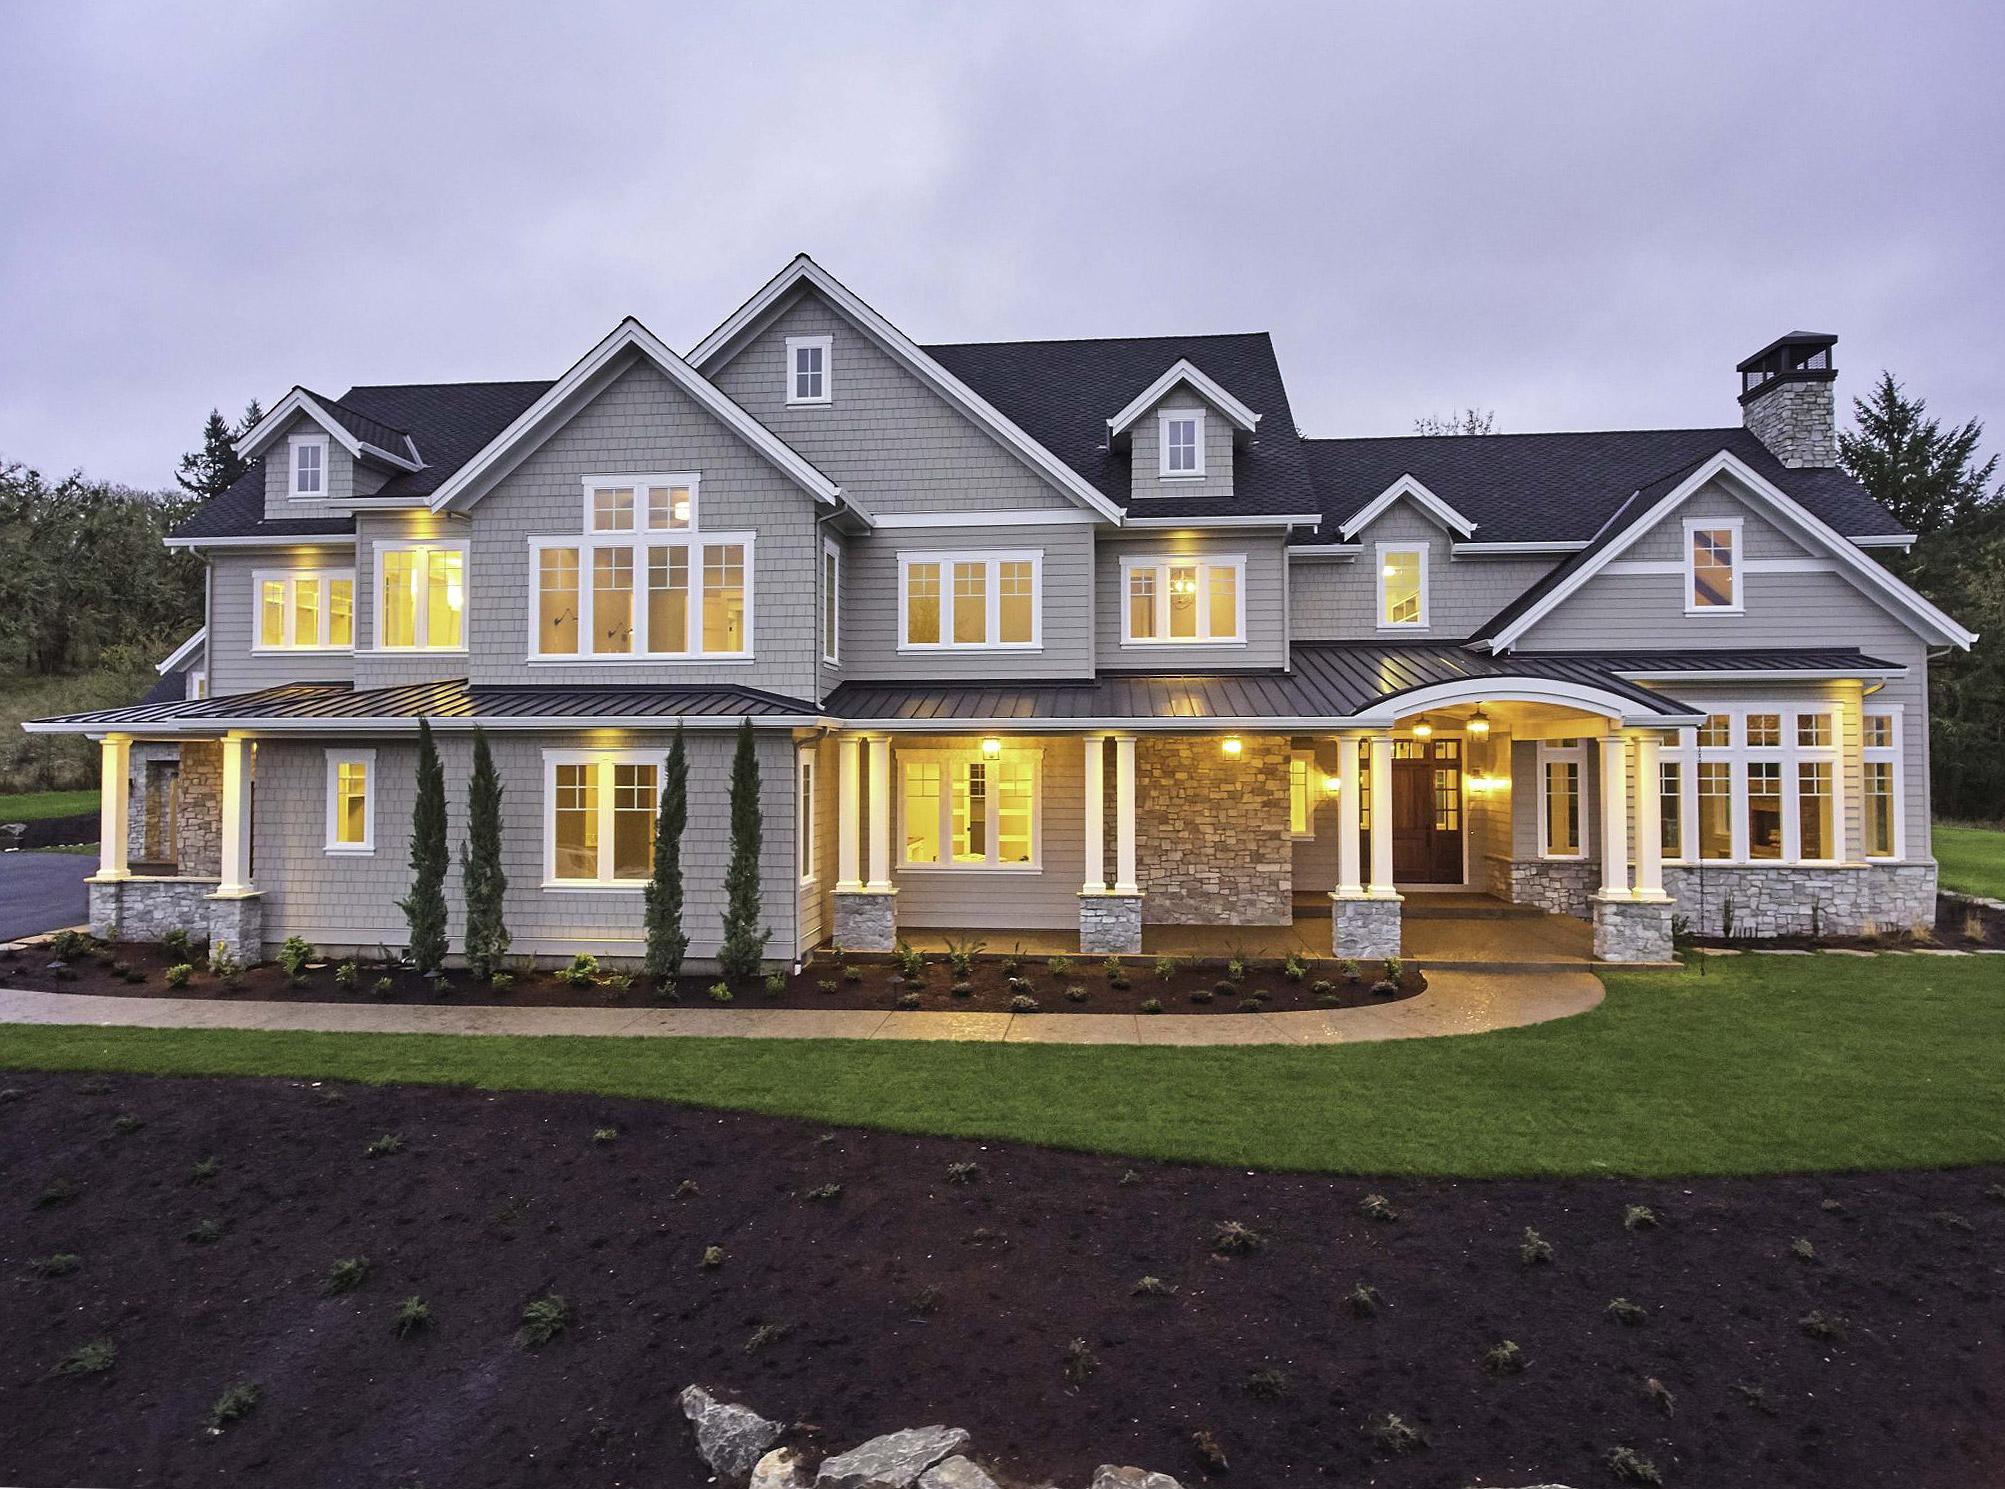 custom home builder- new construction- Eugene, Oregon- DC Fine Homes Inc.